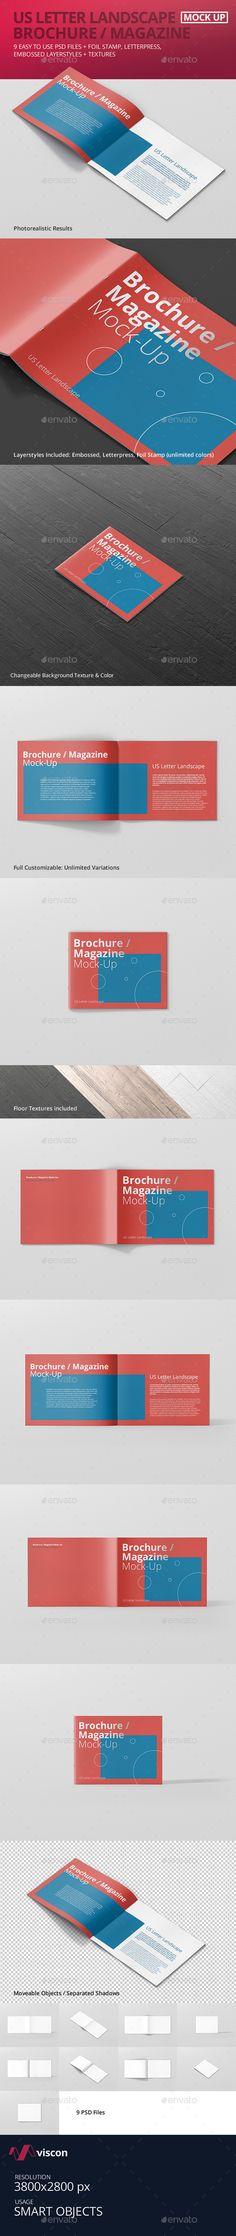 US Letter Landscape Brochure / Magazine Mock-Up #design #graphicdesign #mockup #photoshop #print #magazine #editorial #brochure